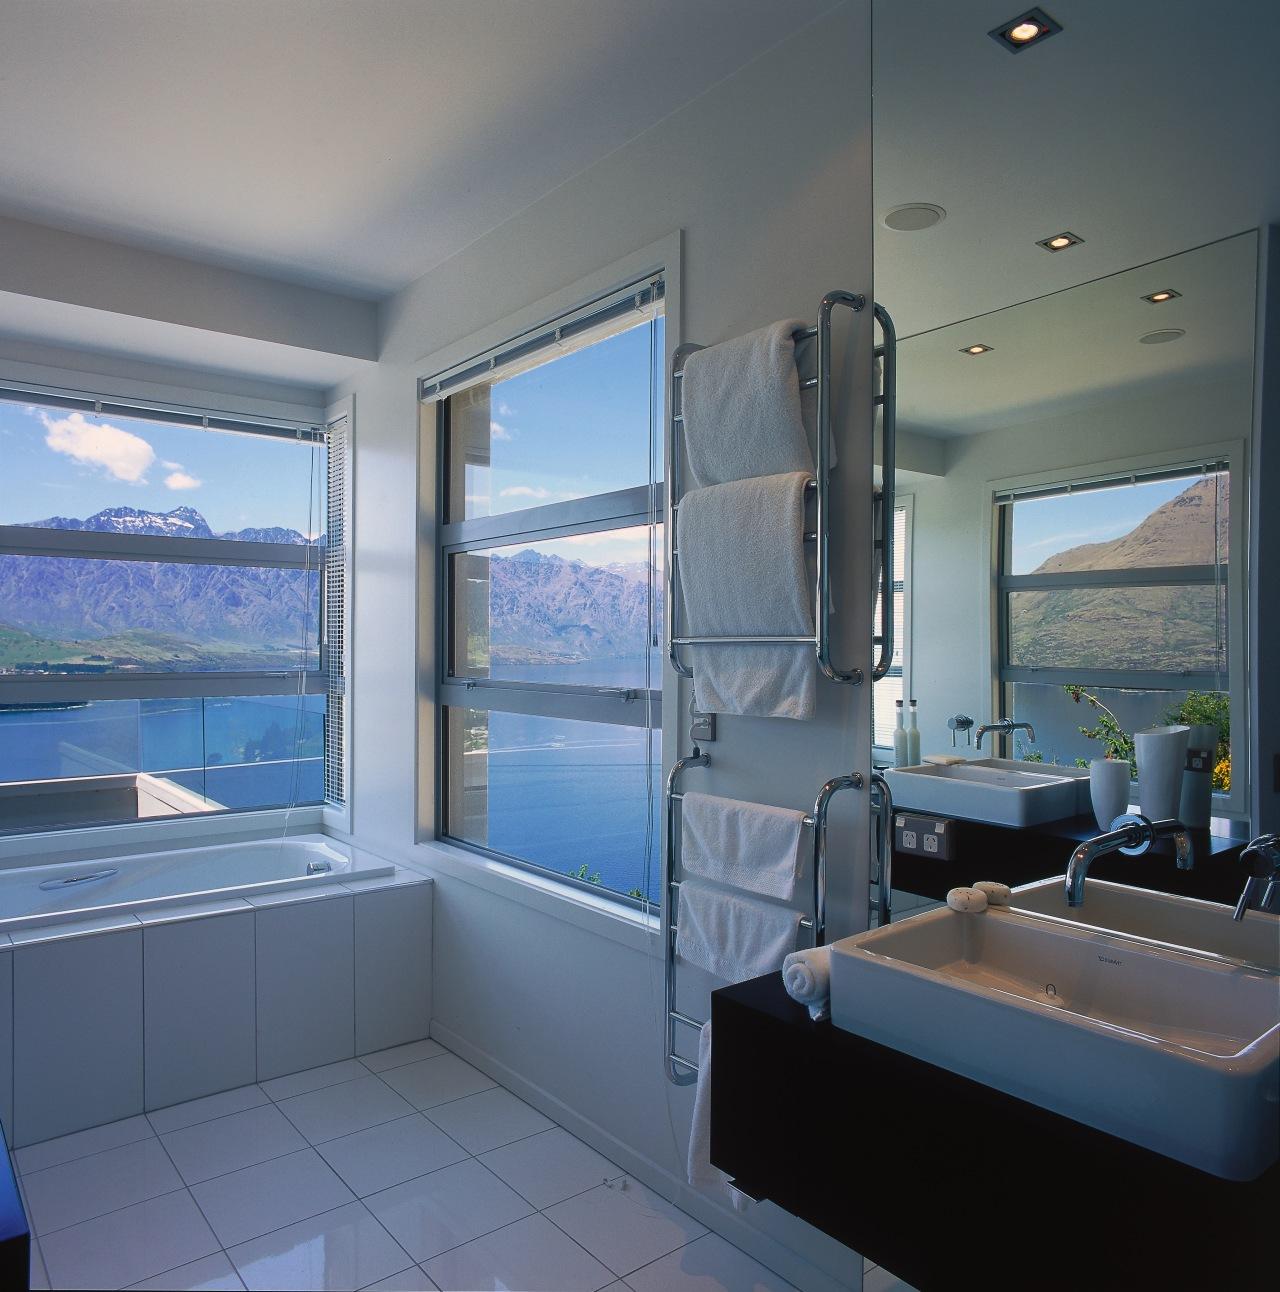 A view of a bathroom, wooden vanity, white bathroom, interior design, real estate, room, window, gray